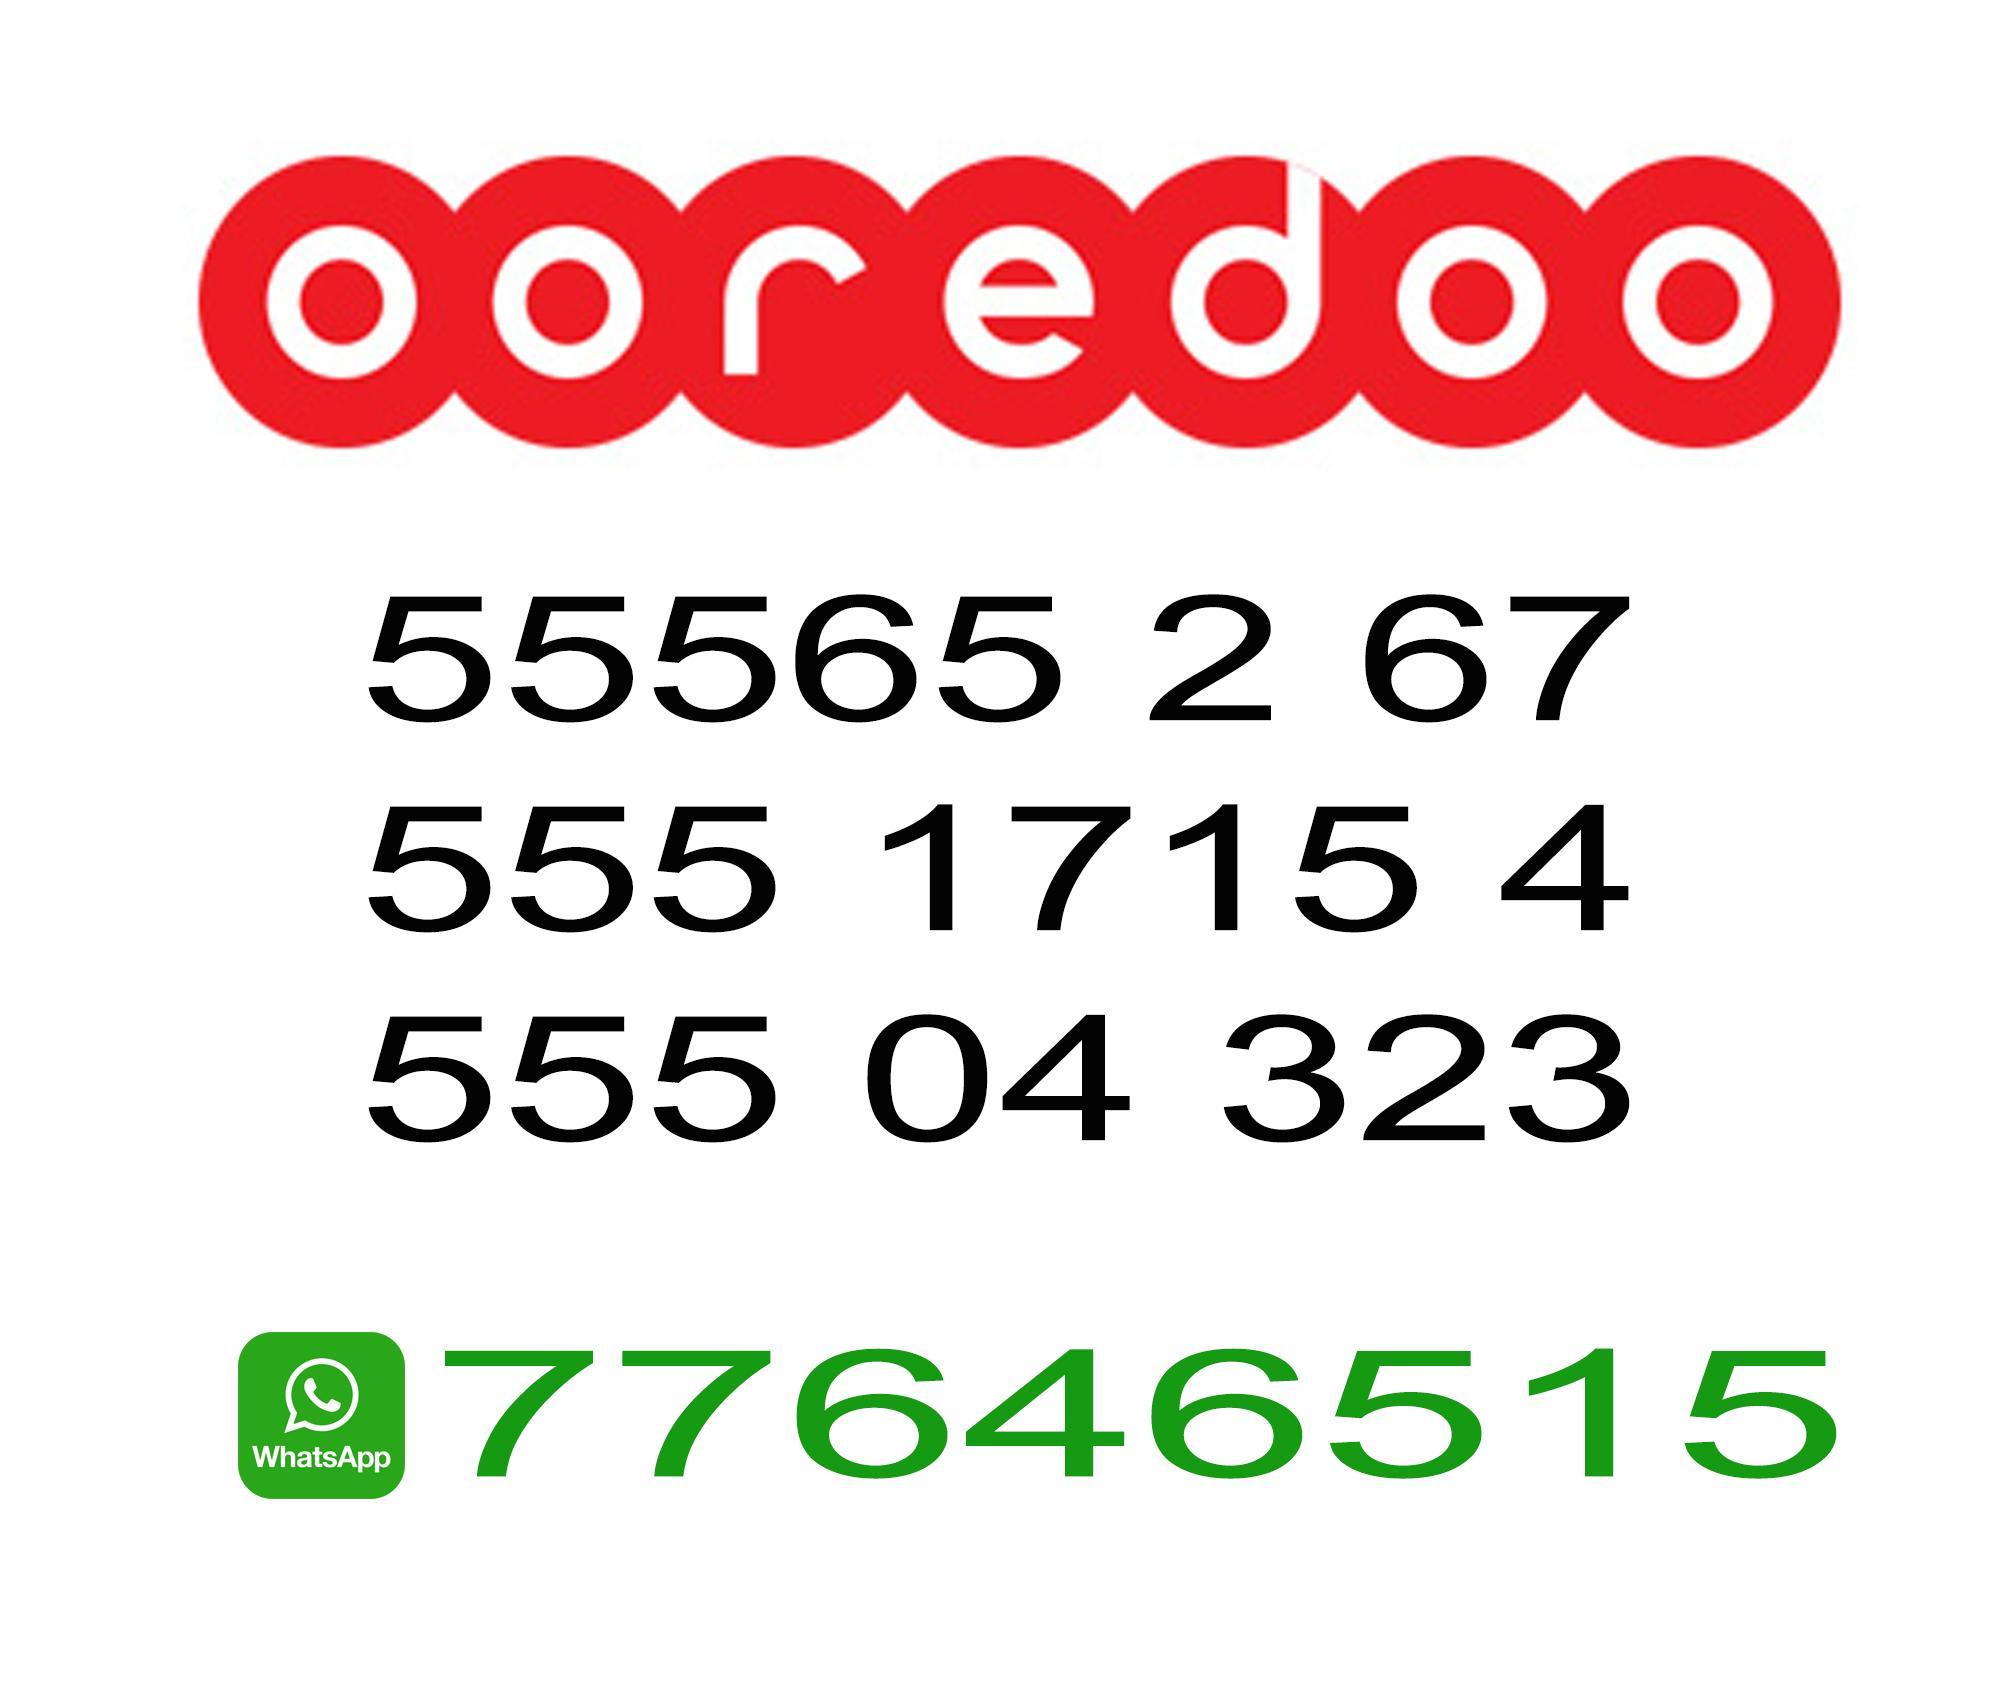 55565267, 55517154, 55504323 Ooredoo New Prepaid